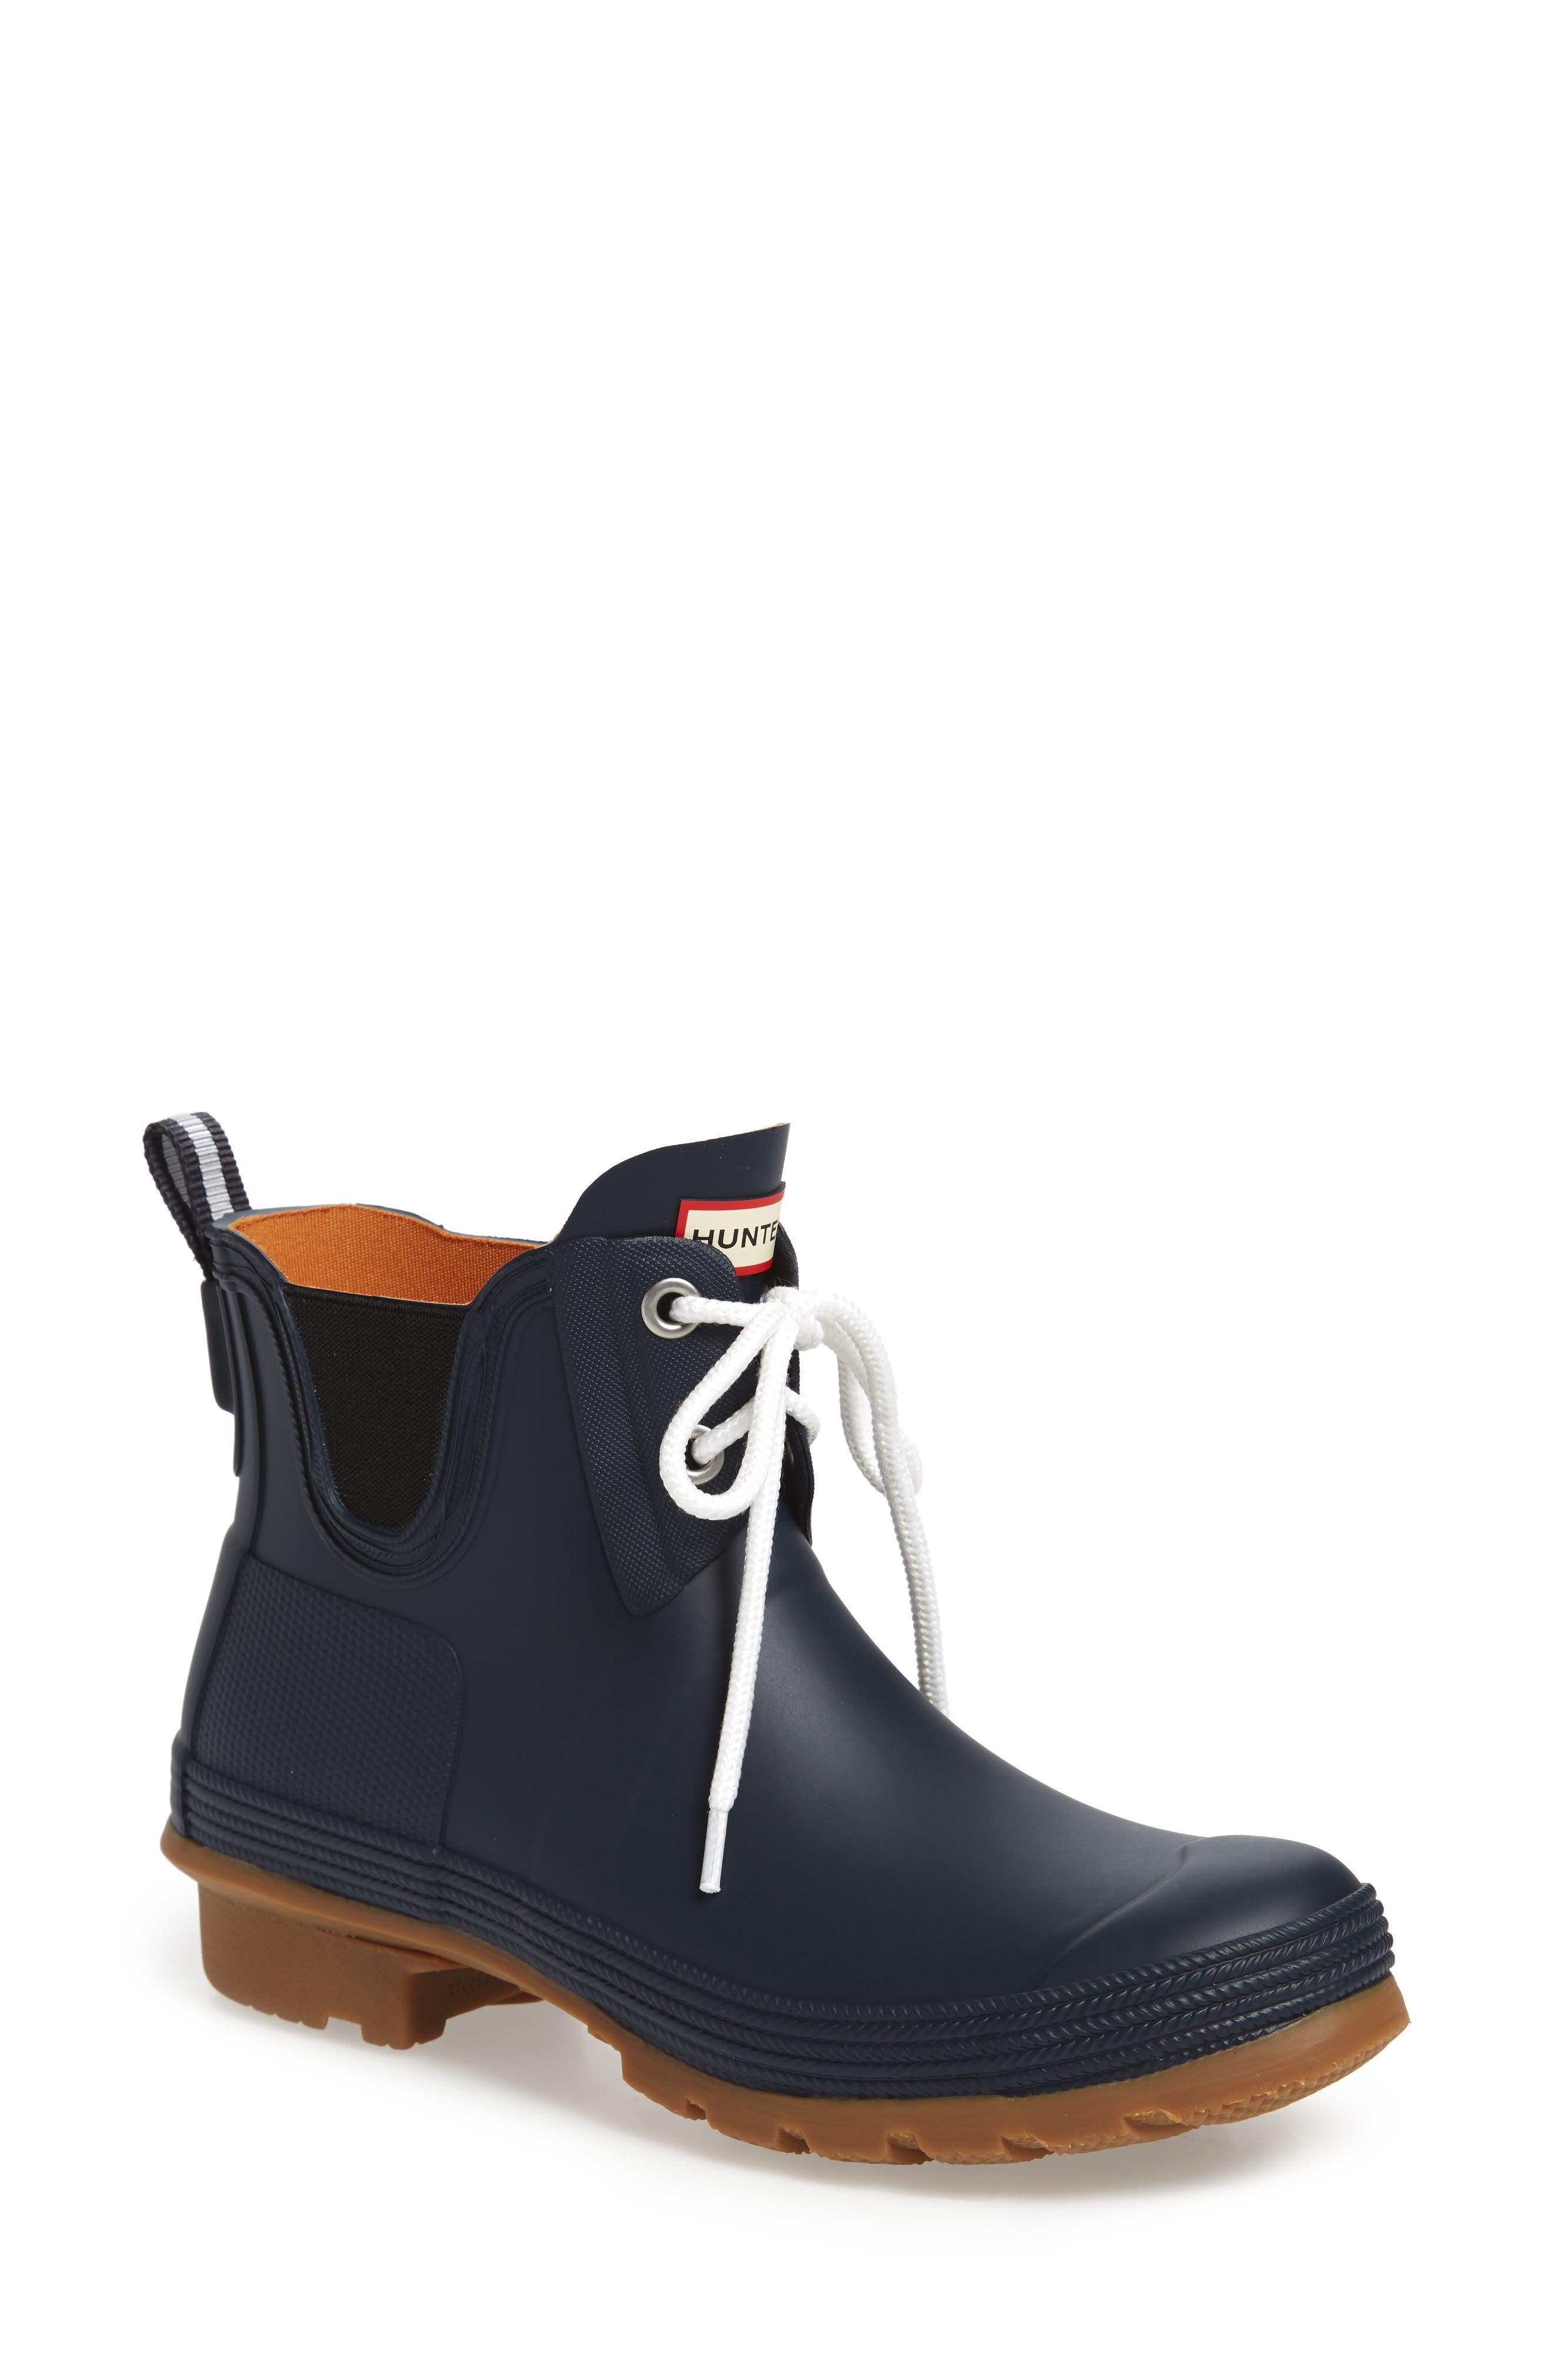 Original Sissinghurst Waterproof Pull-On Boot,                         Main,                         color, Navy/ Gum